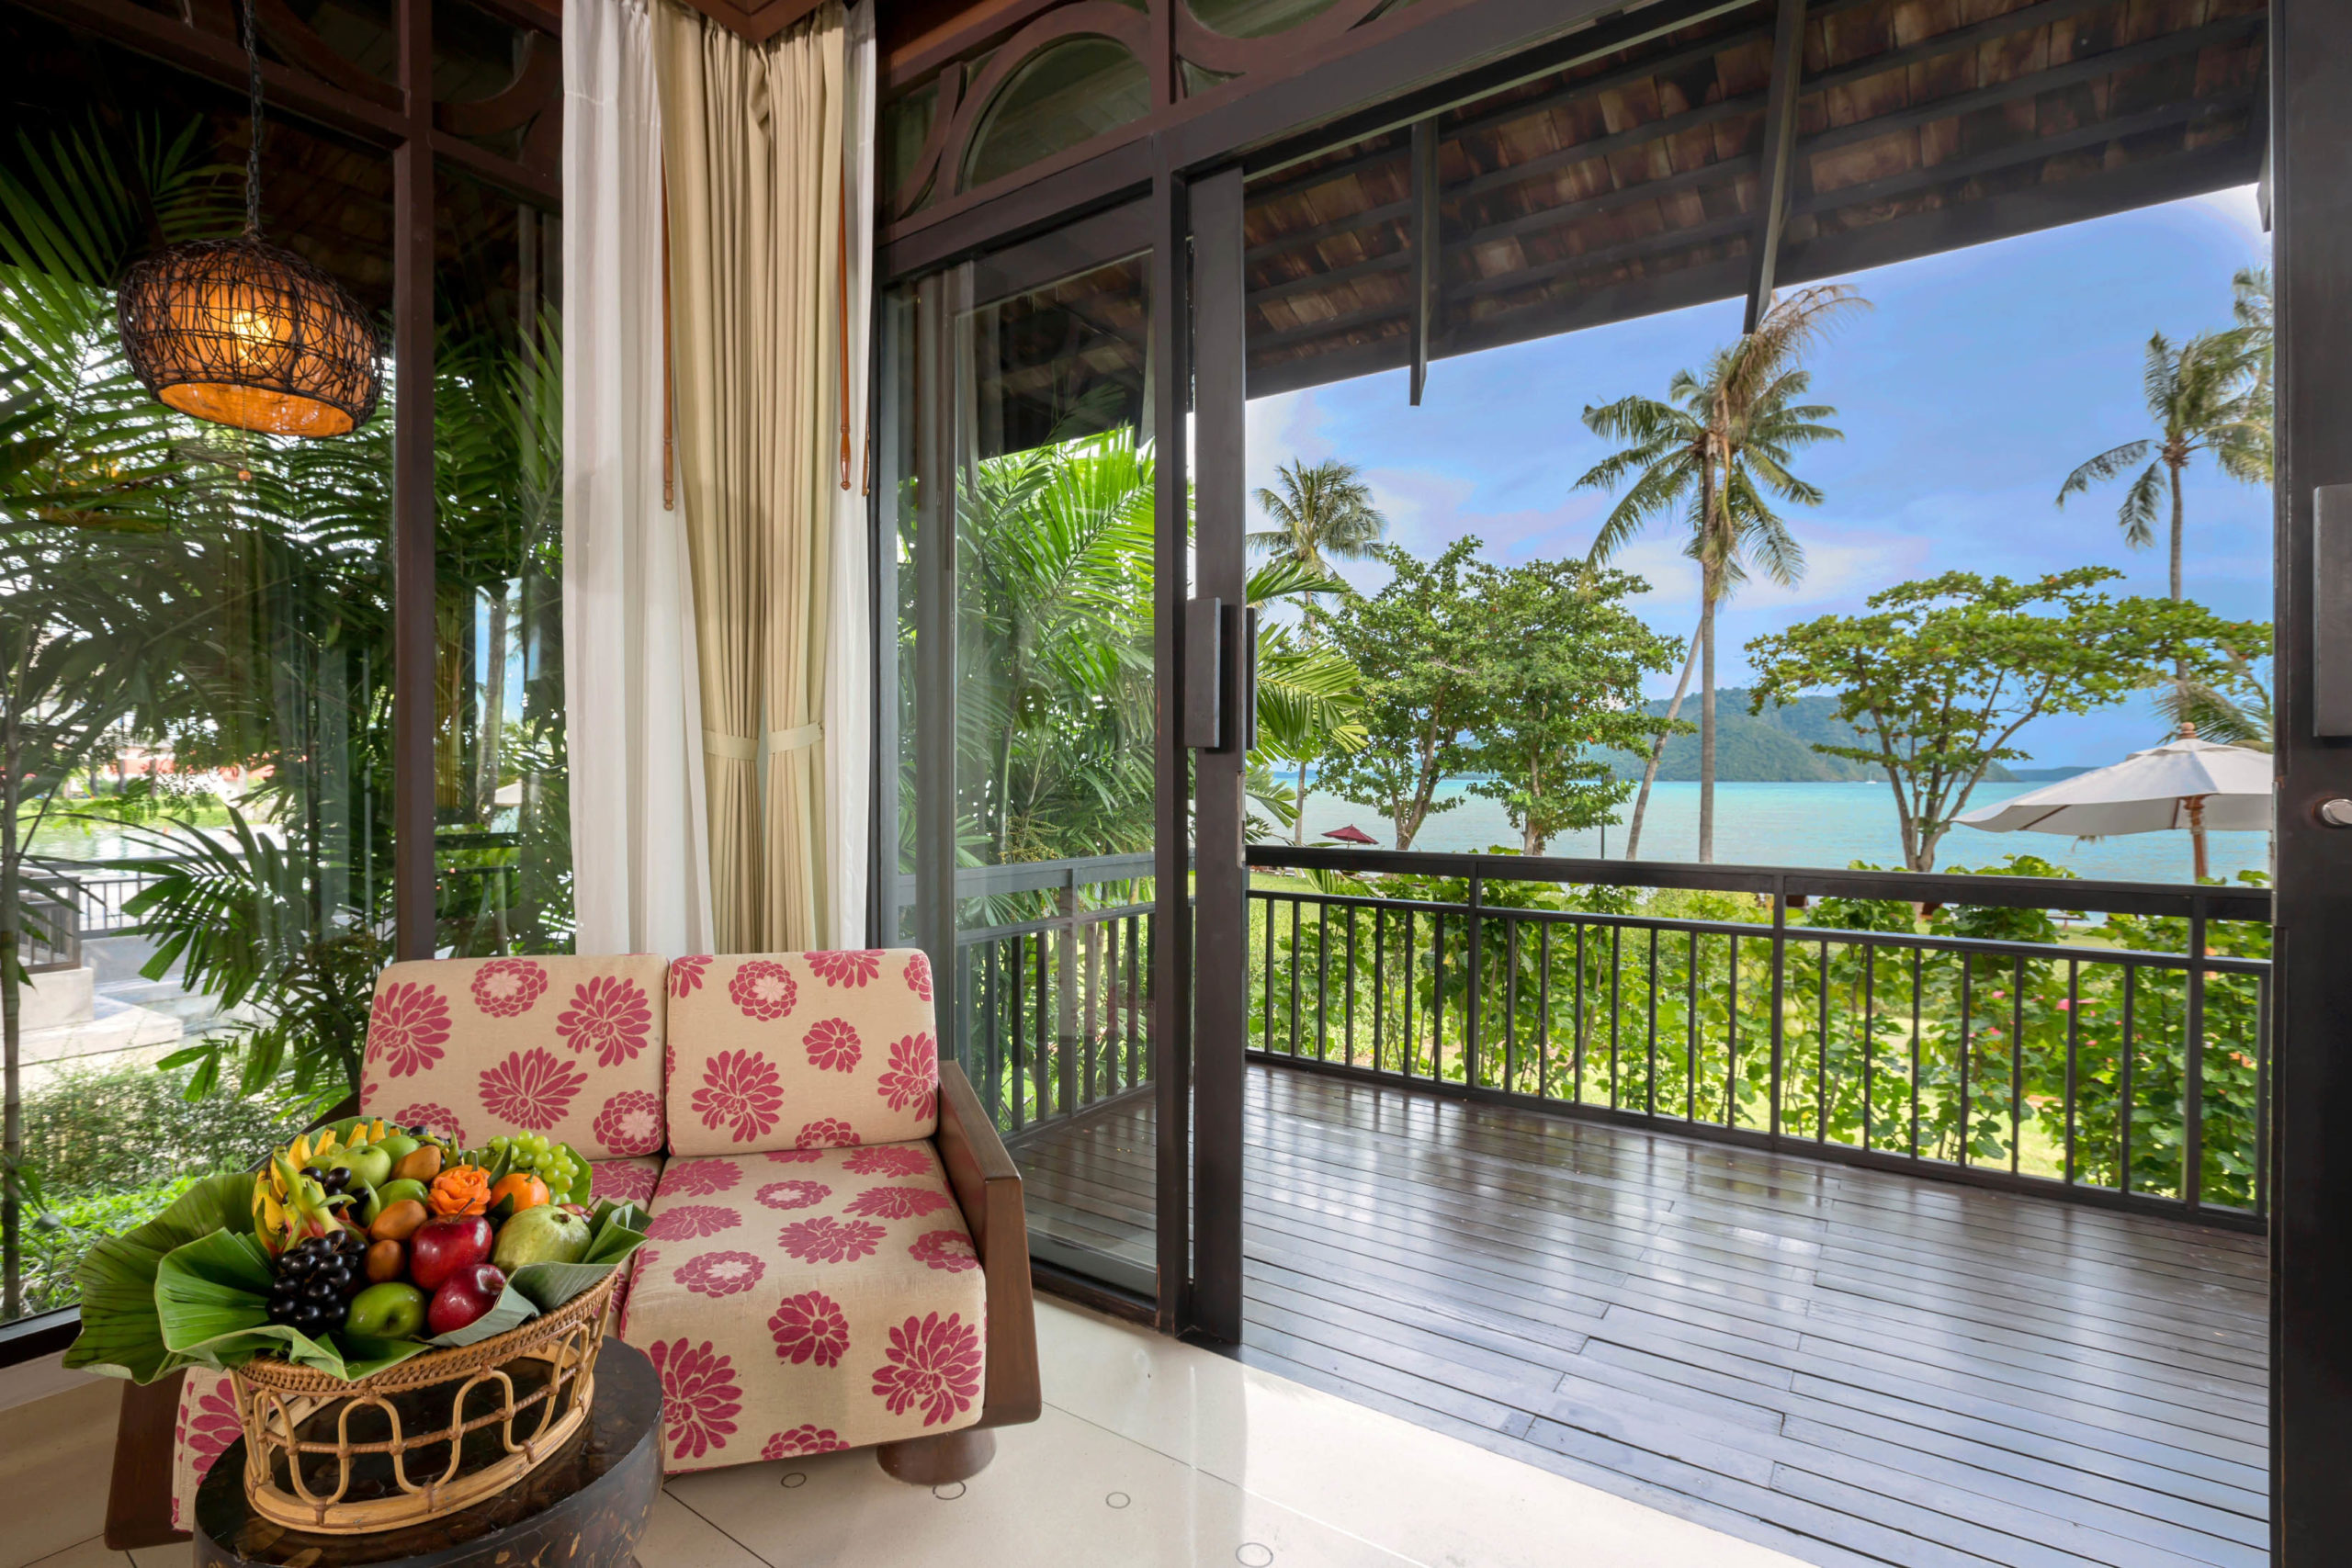 003_Deluxe Beachfront Villa_Bedroom The Vijitt Resort Phuket